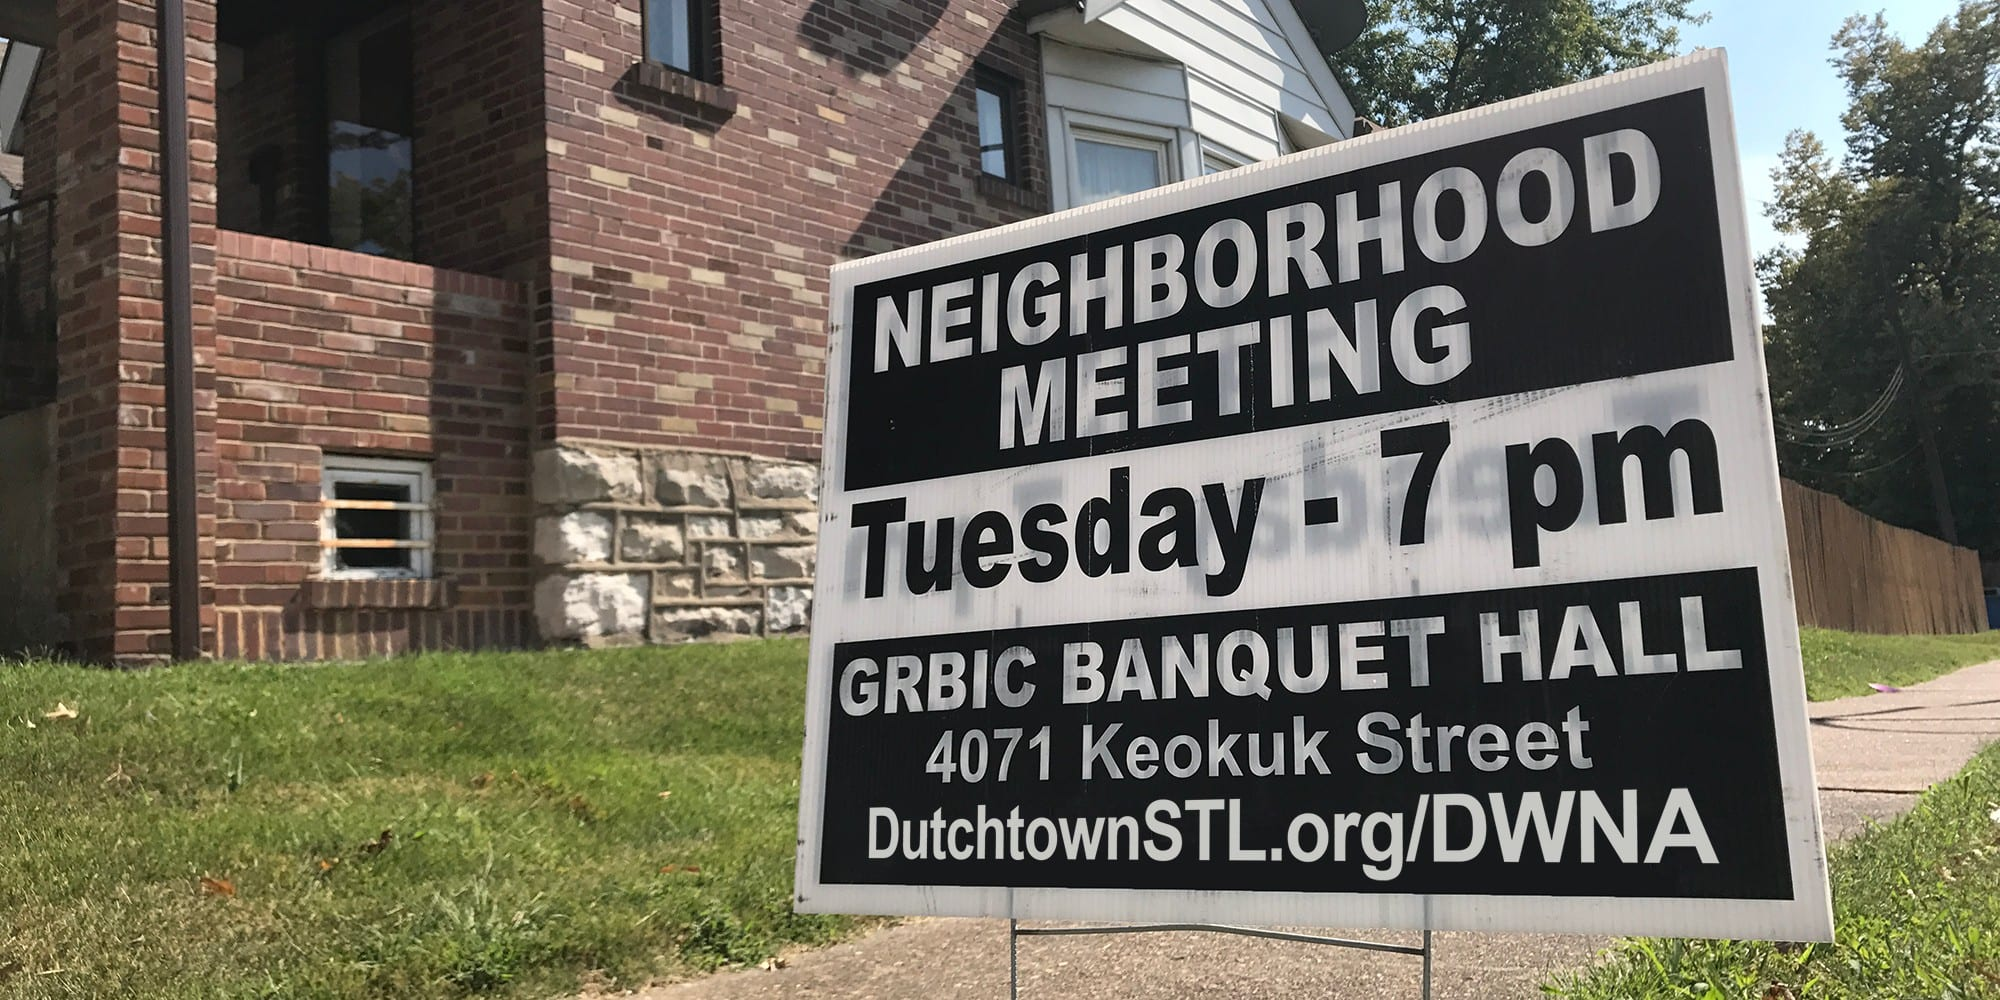 Dutchtown West neighborhood meeting sign.